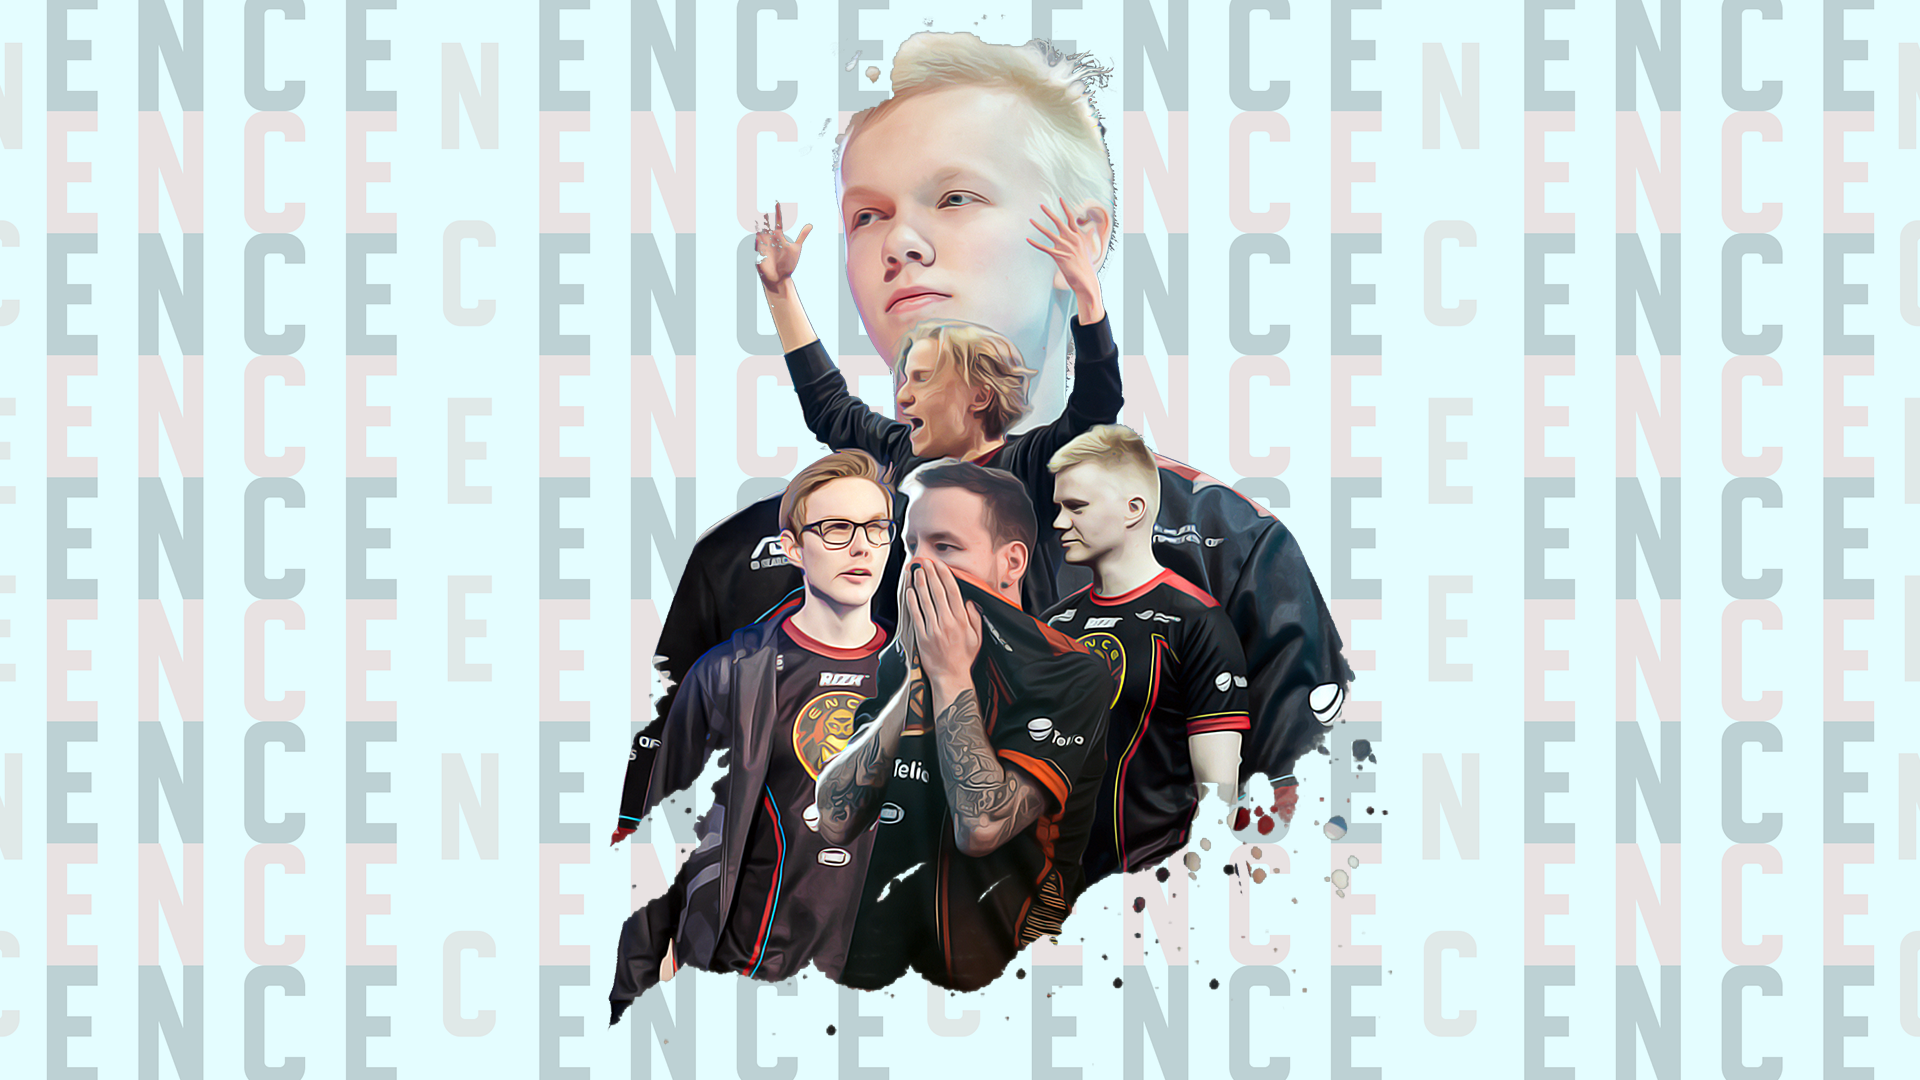 ENCE Wallpaper